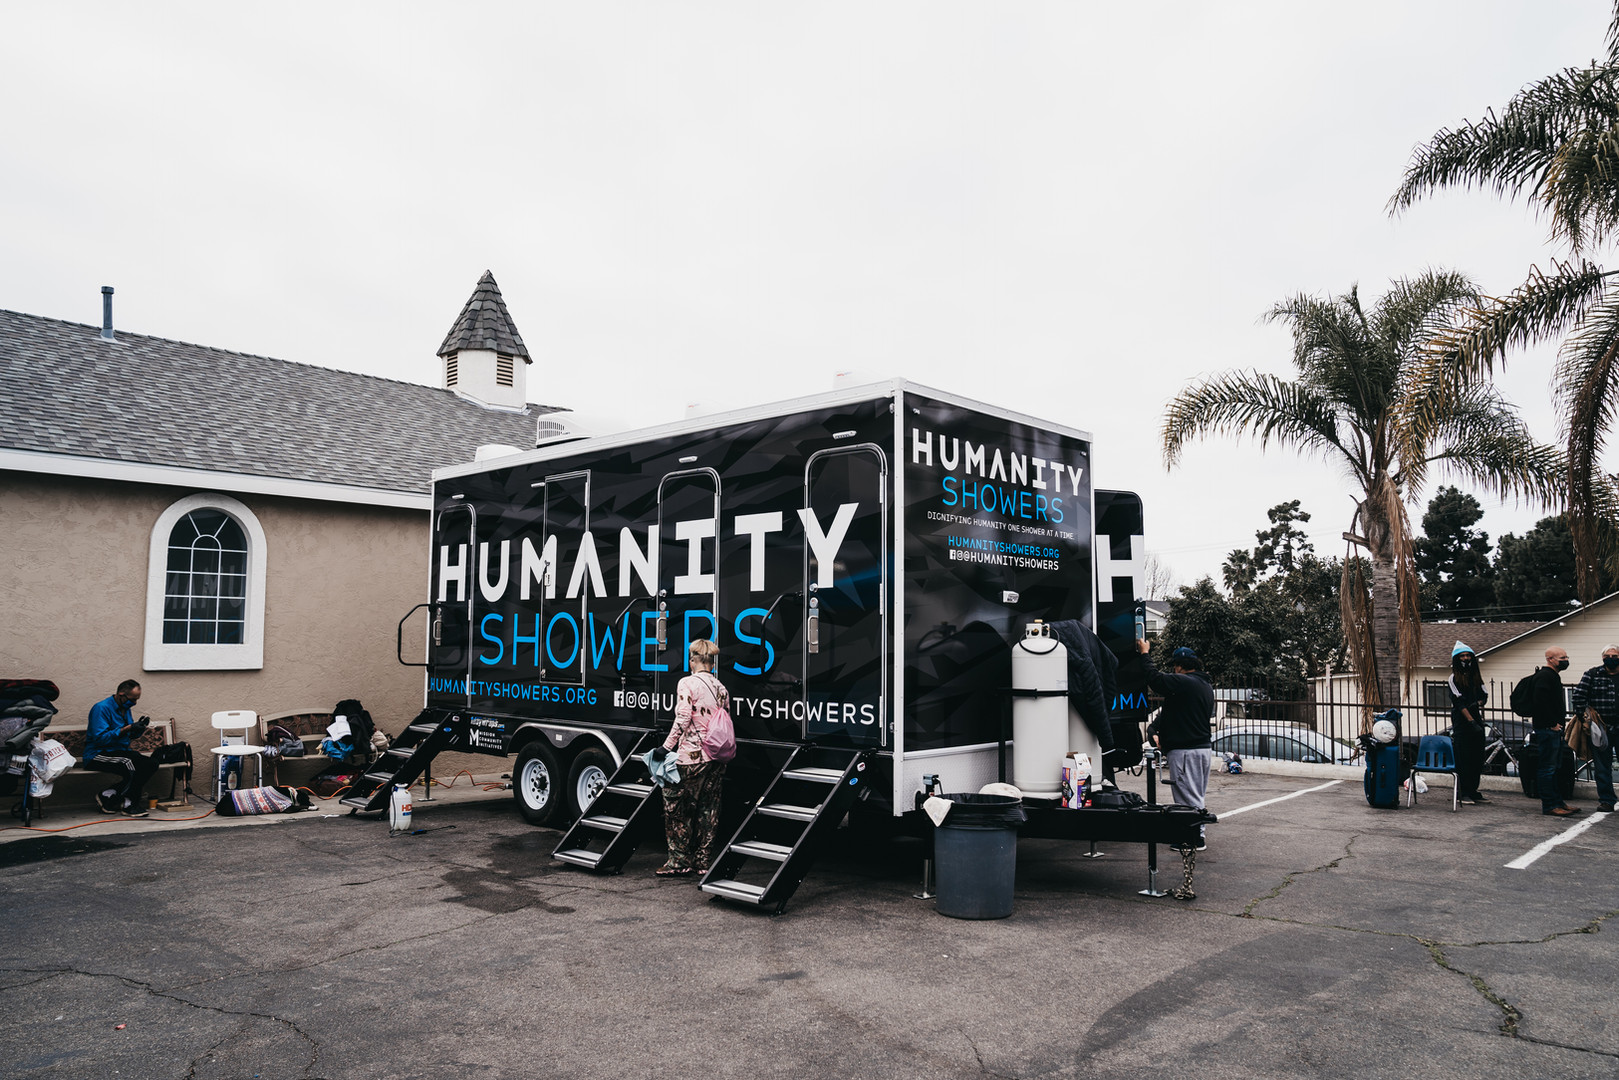 Humanity Showers